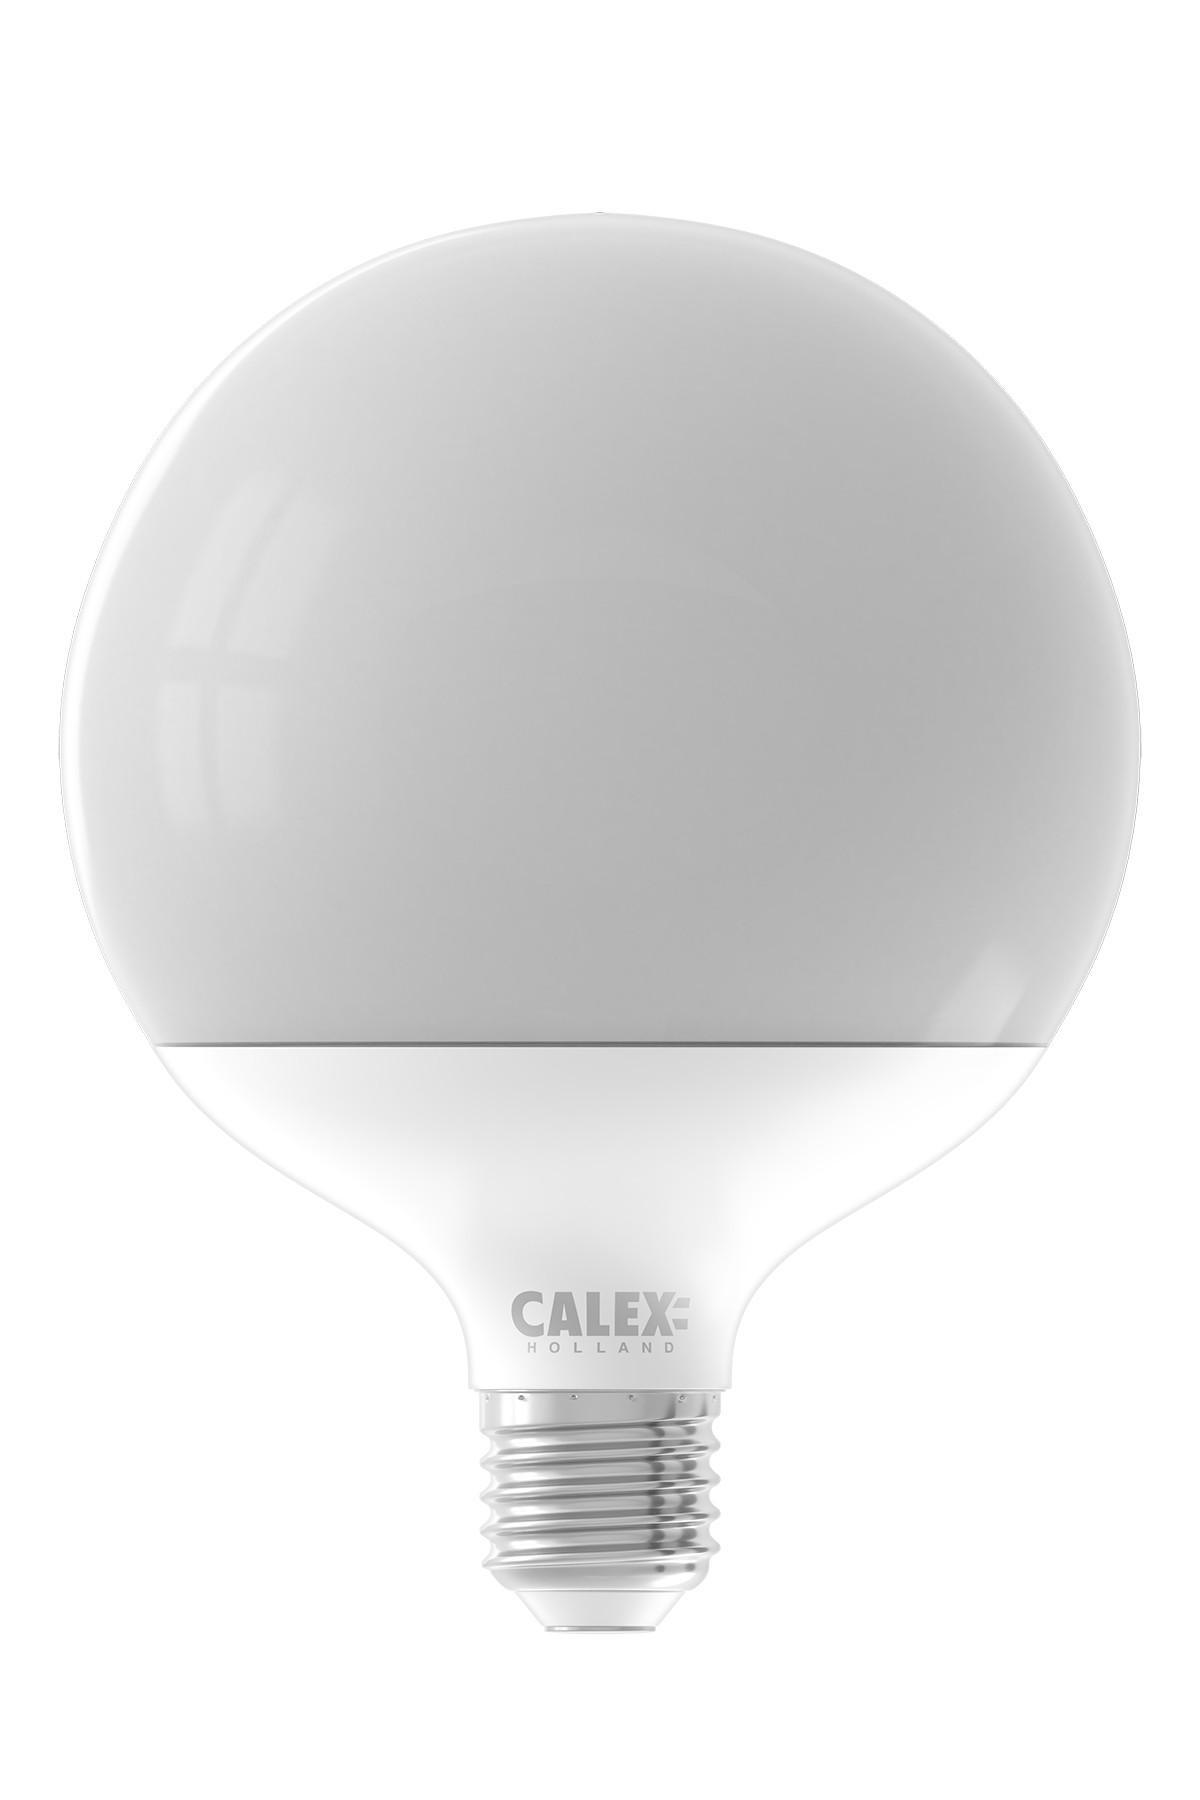 Calex LED Globe Lamp 220-240V 15W